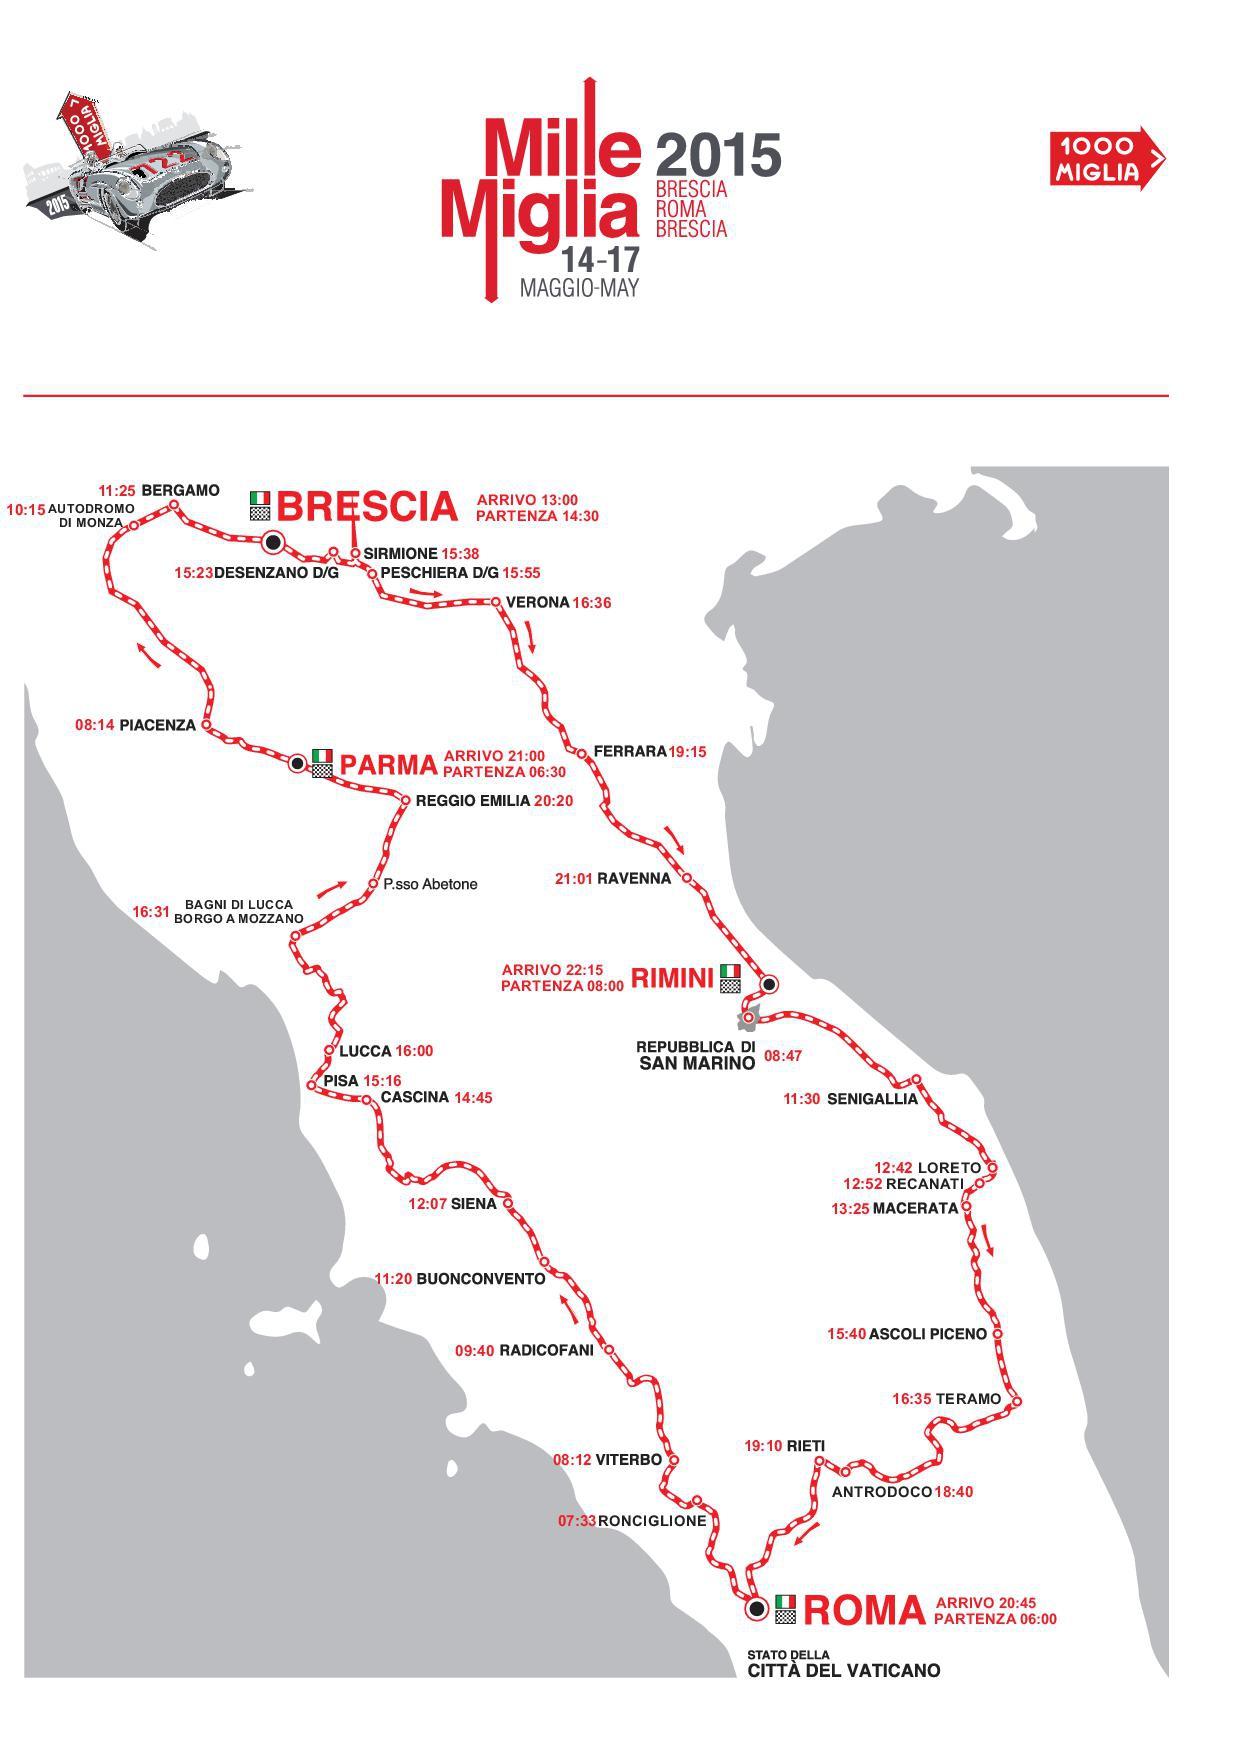 Roadmap of Mille Miglia 2015